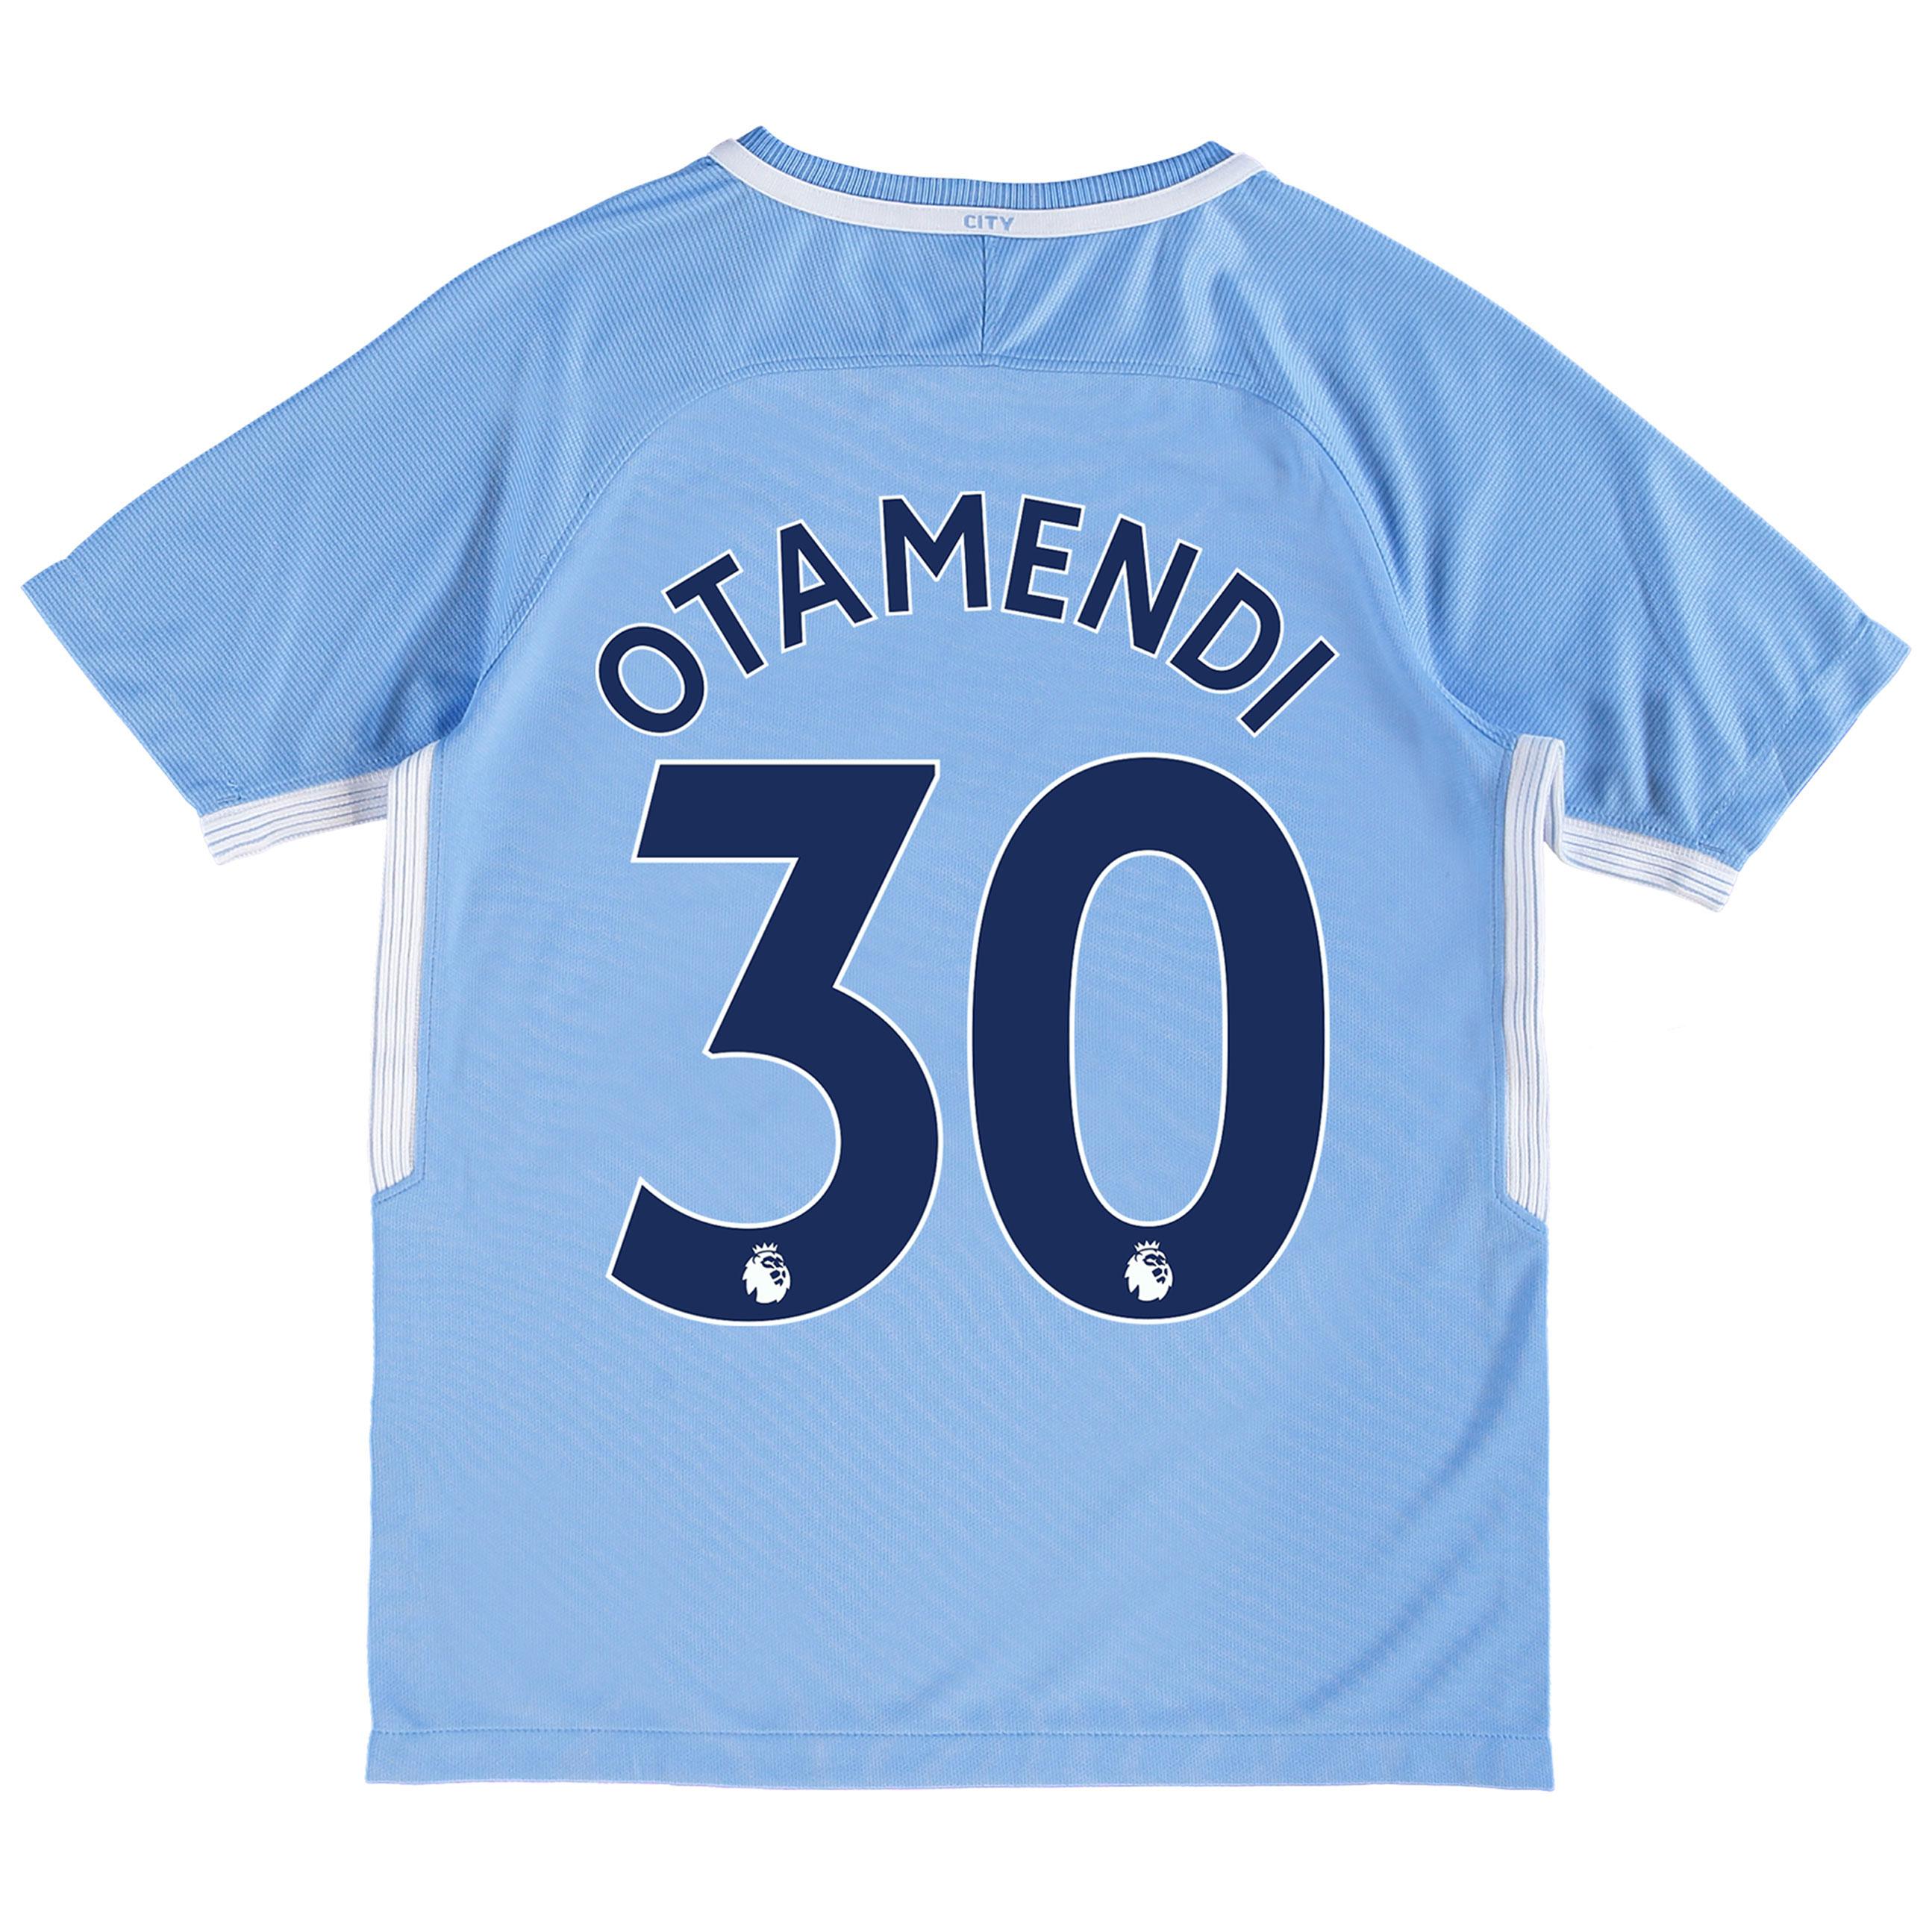 Manchester City Home Stadium Shirt 2017-18 - Kids with Otamendi 30 pri